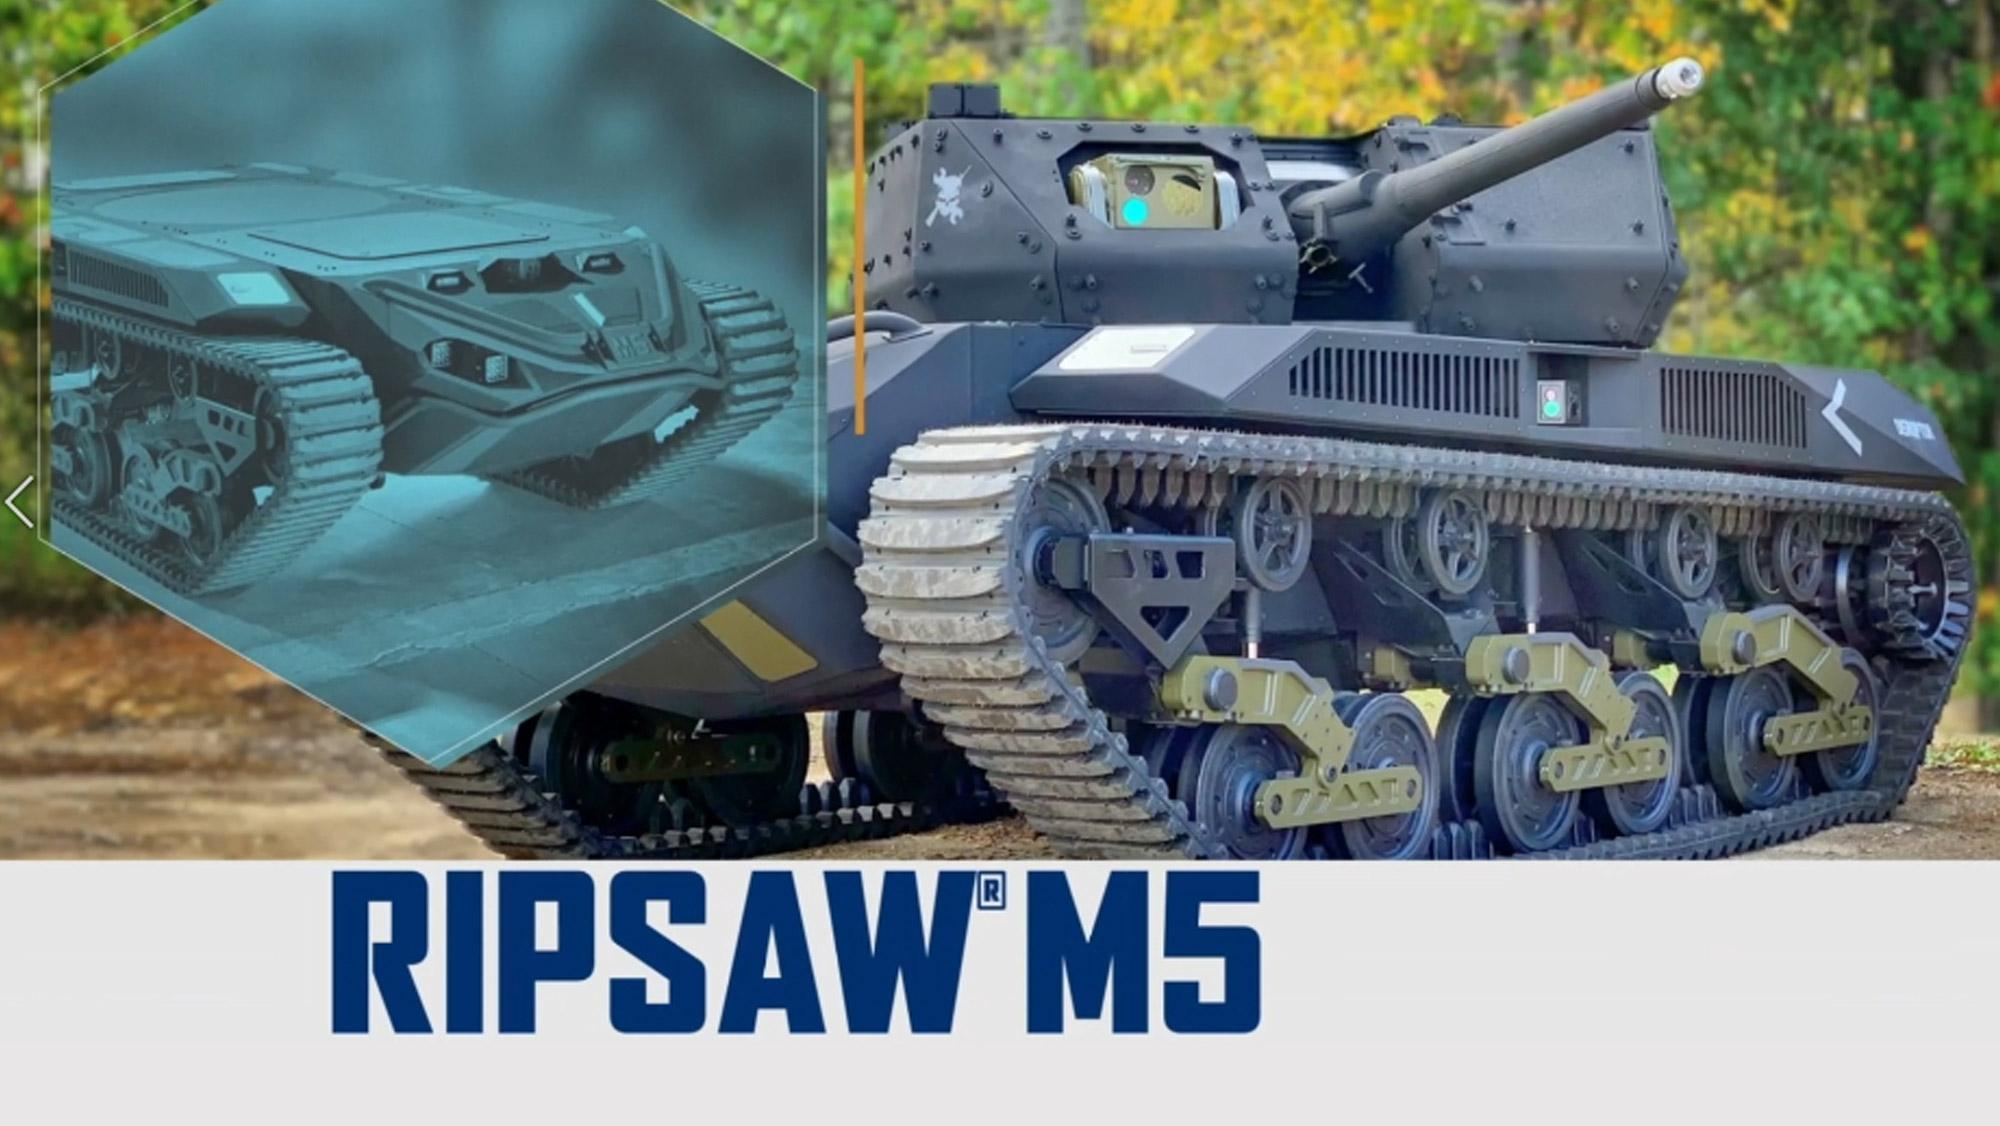 Ripsaw M5 AUSA 2021